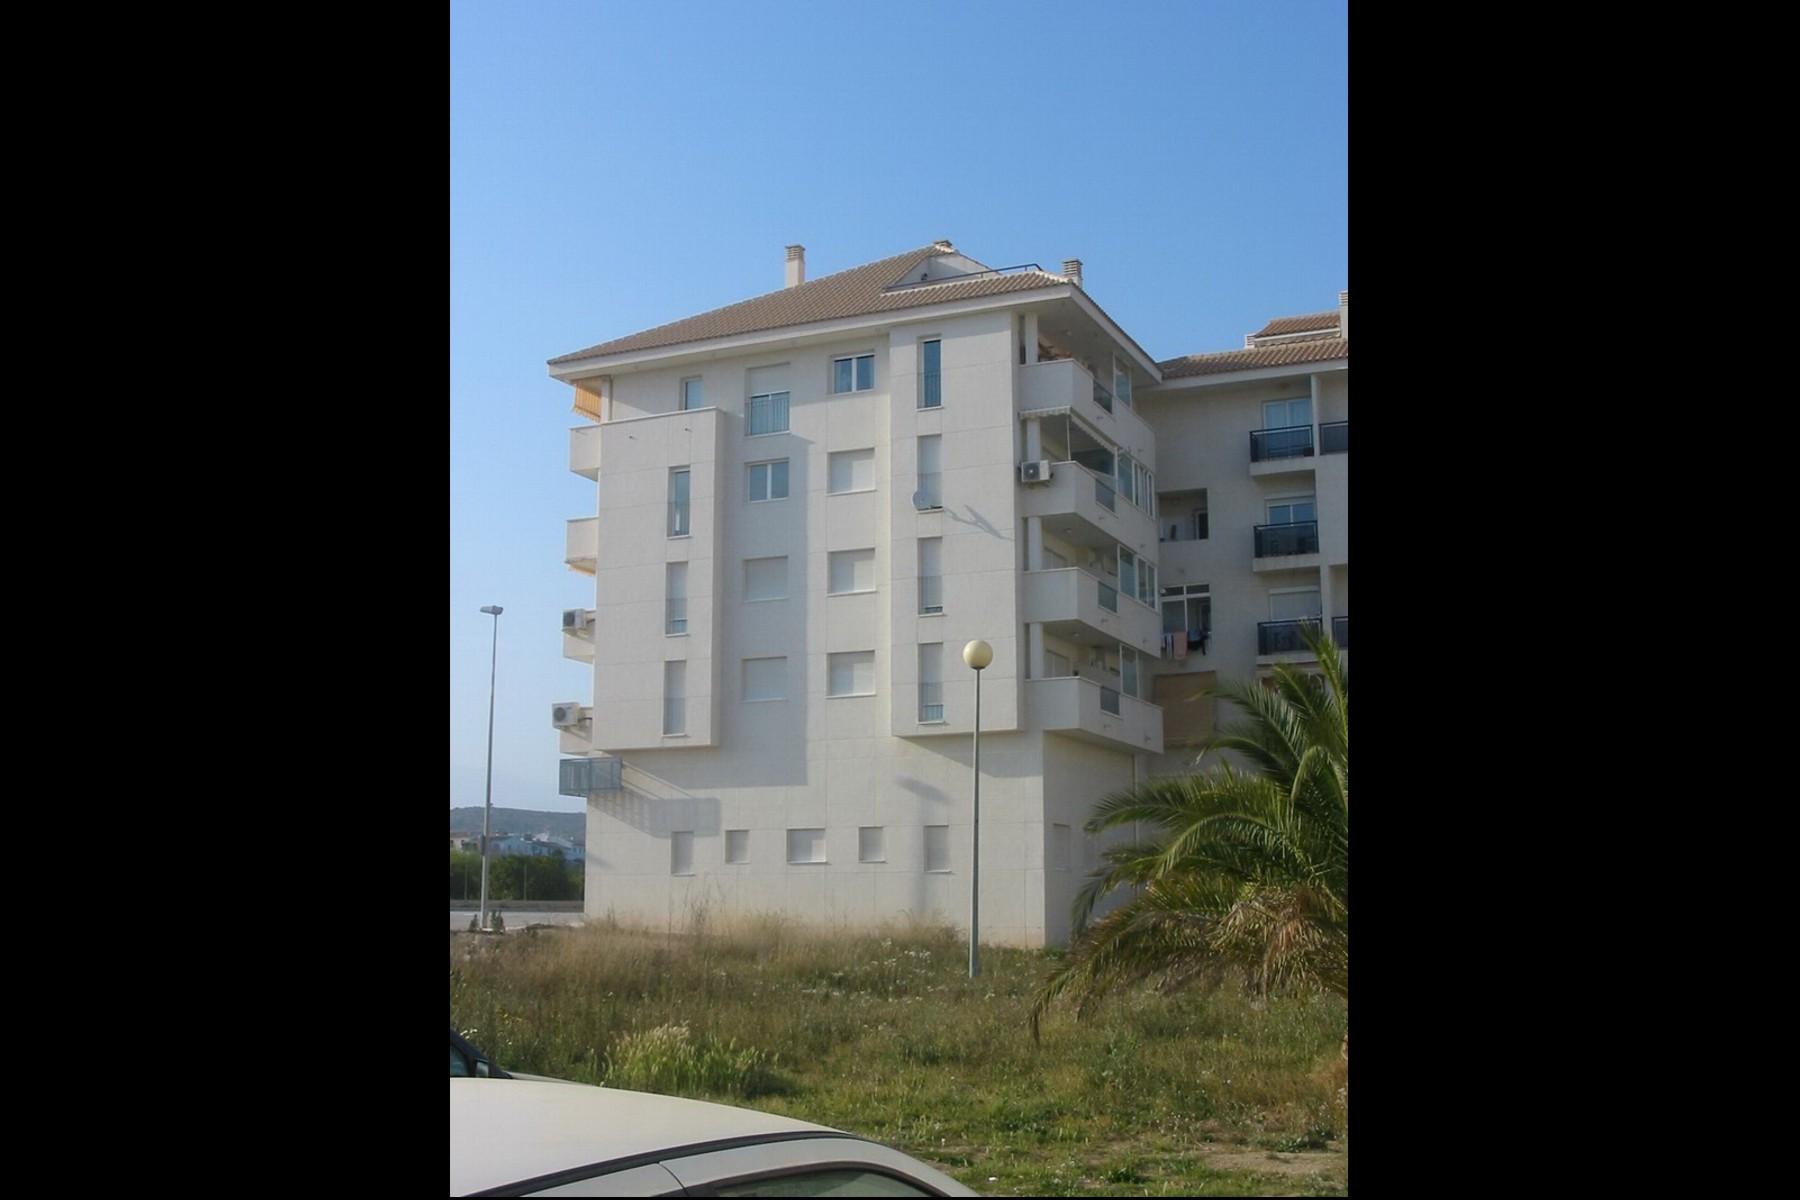 Imaginarq-053-Edificio-Viviendas-Altea-Alicante-09A